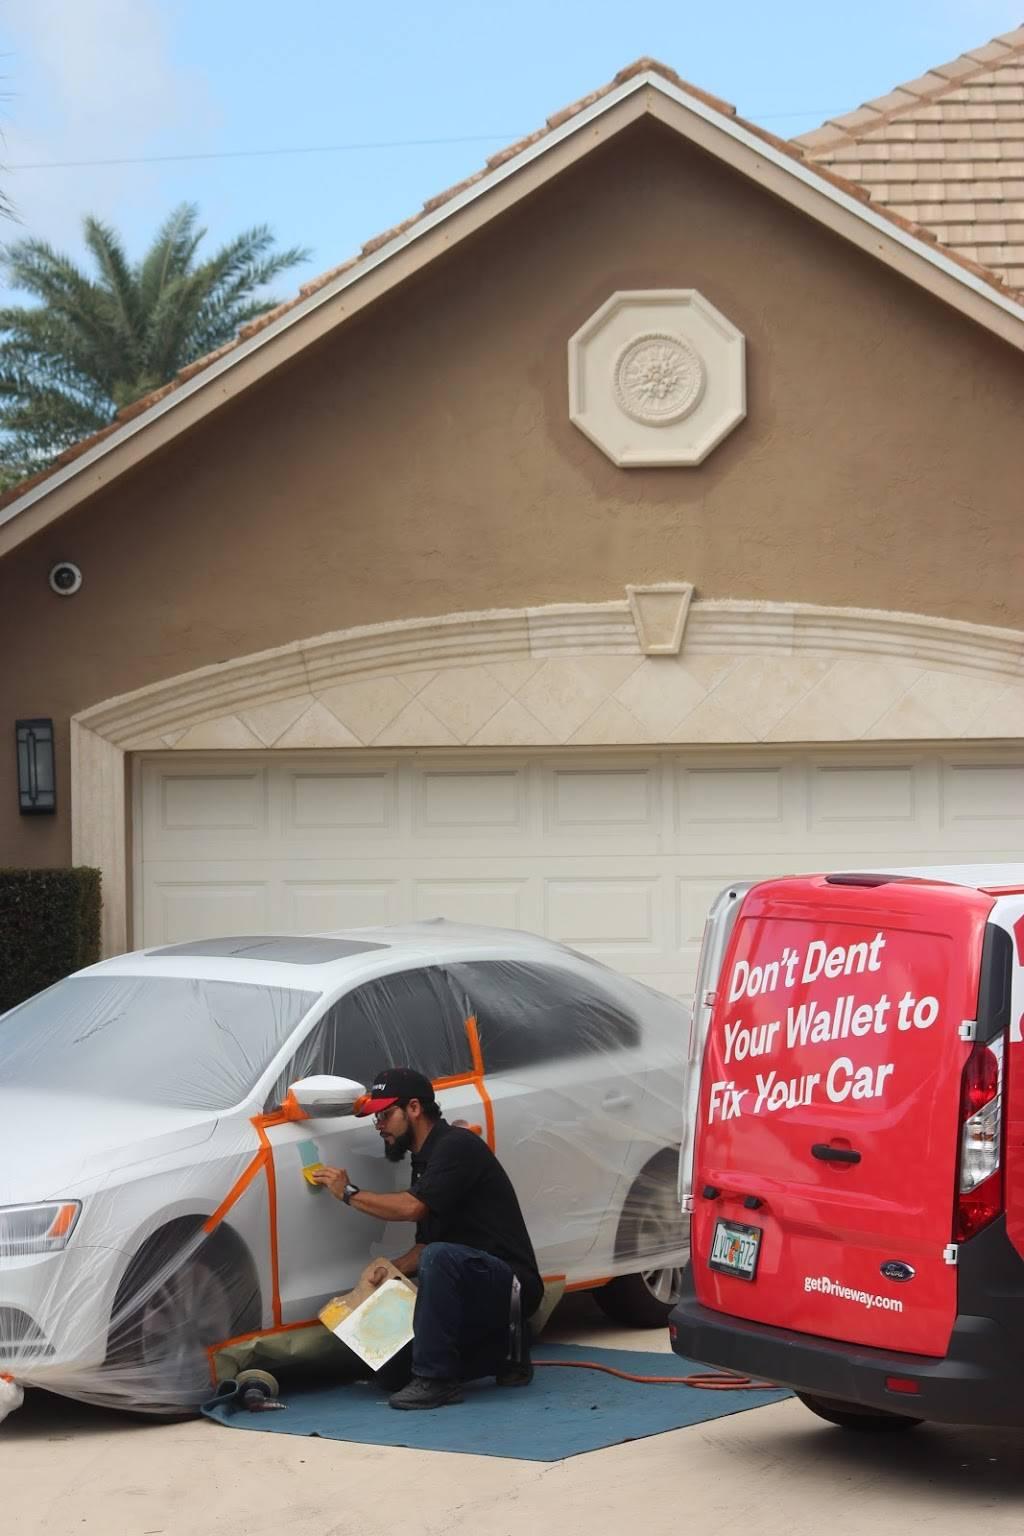 Driveway - car repair  | Photo 1 of 9 | Address: 3101 Park Blvd, Palo Alto, CA 94306, USA | Phone: (800) 274-5978